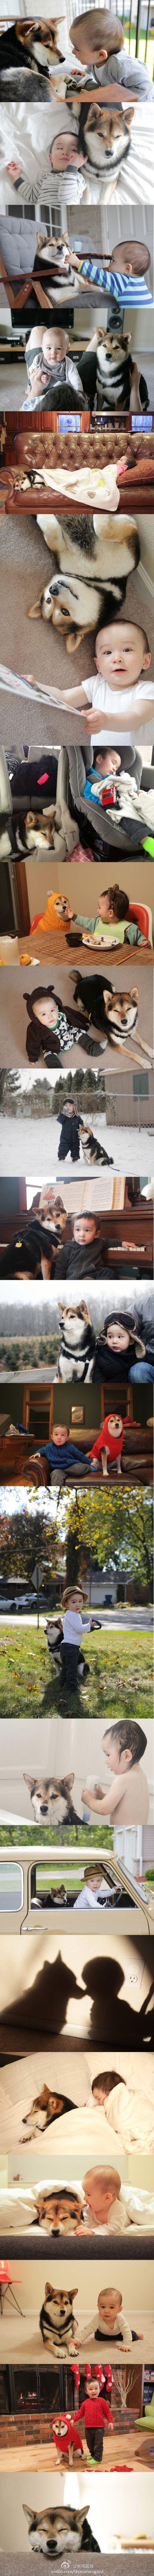 baby Issa and puppy Maru <3